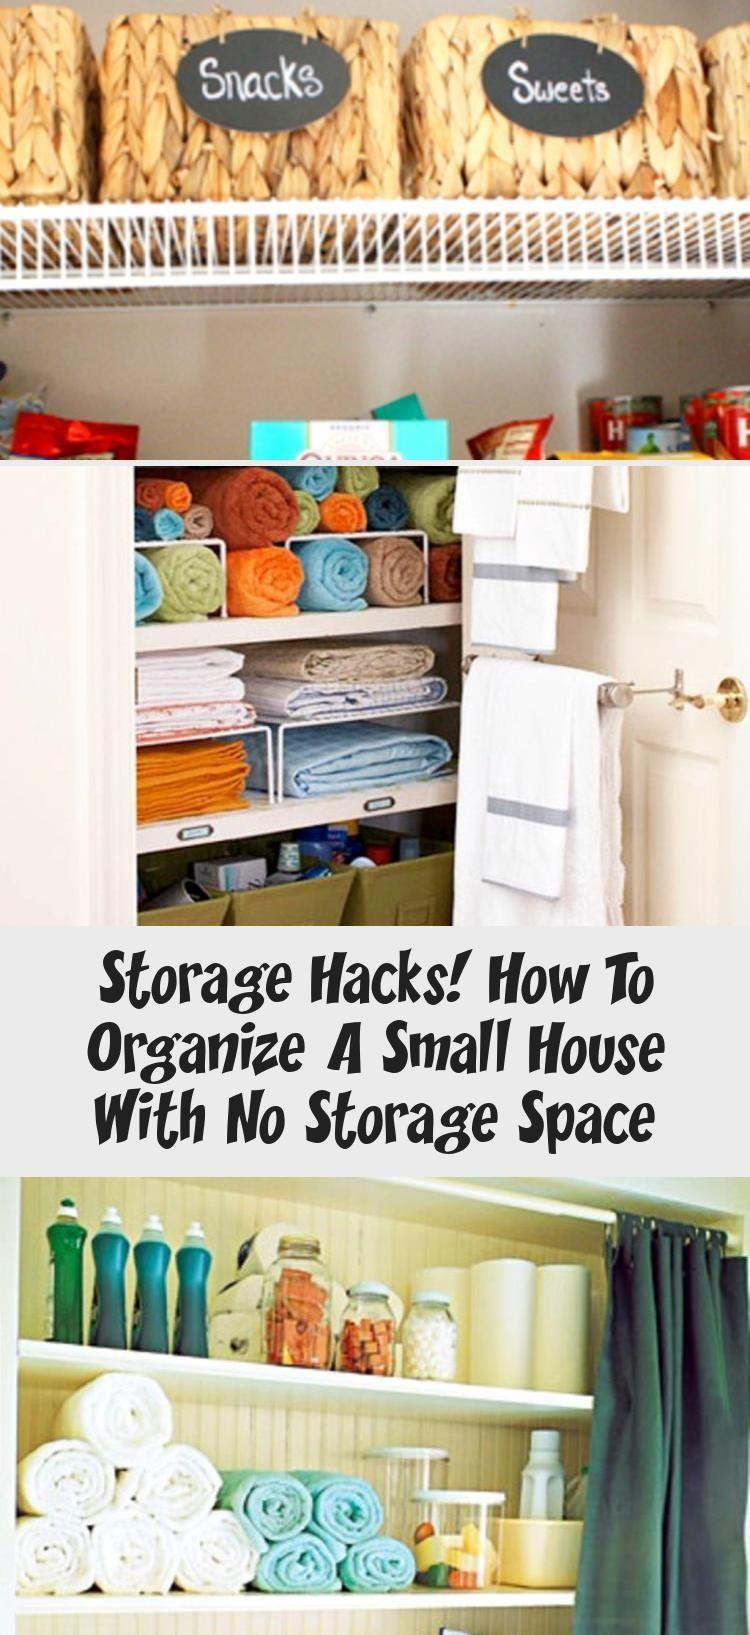 Storage Hacks How To Organize A Small House With No Storage Space Organizingdormrooms Smart Organizing Storage Hacks Storage Spaces Small House Organization